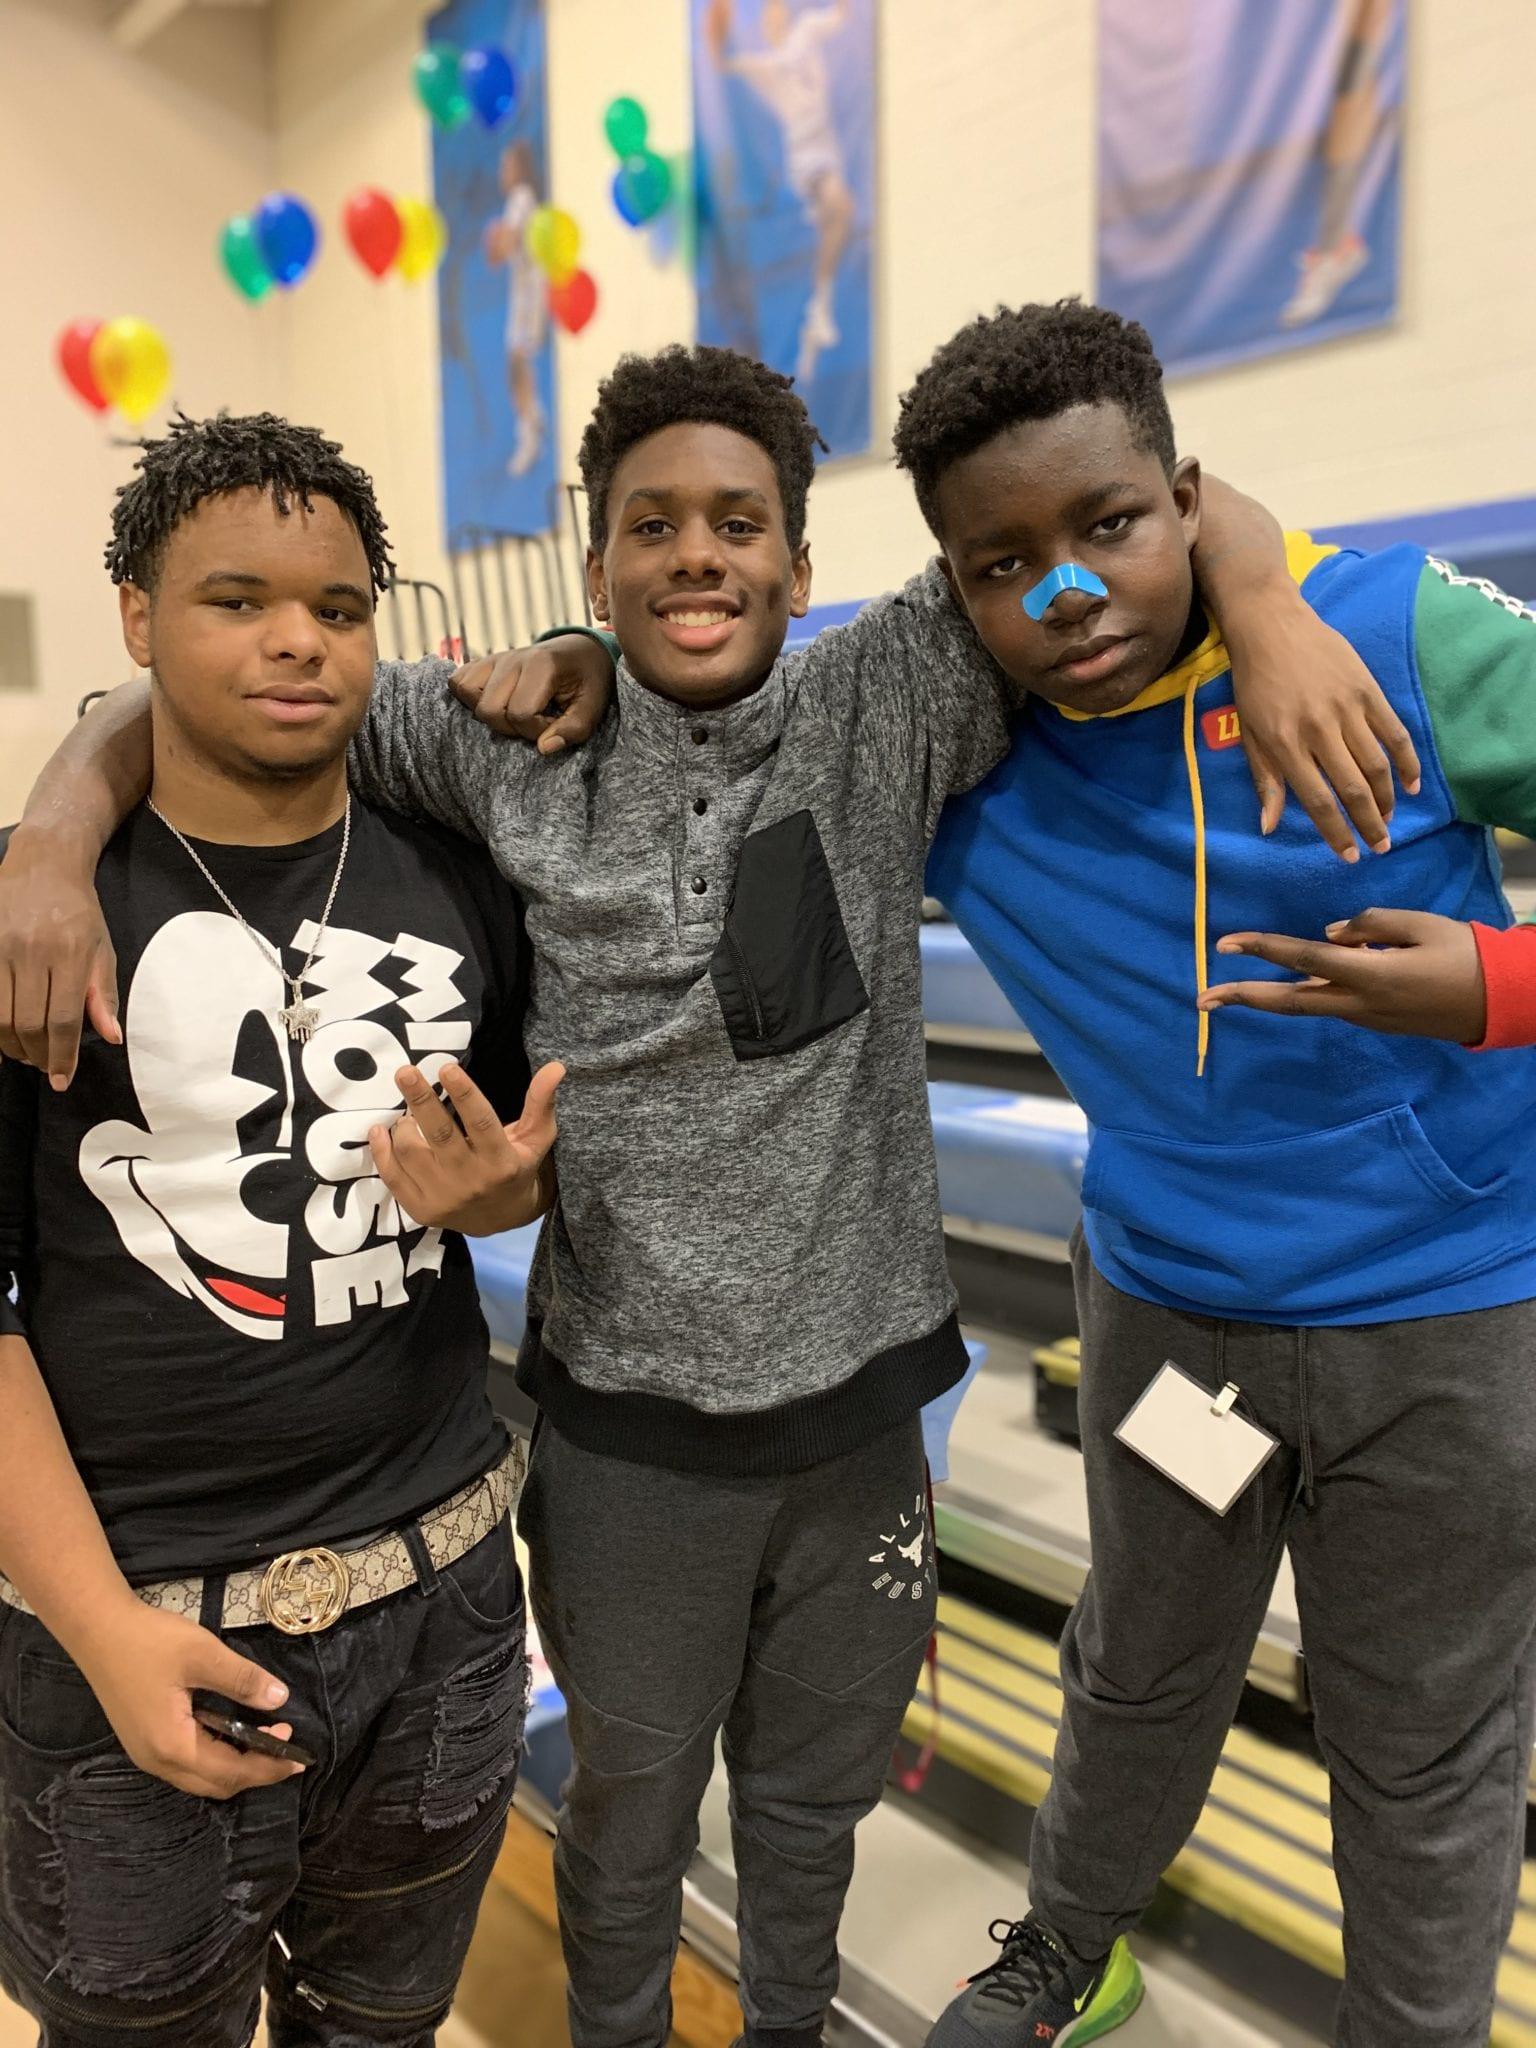 teen boys KAN